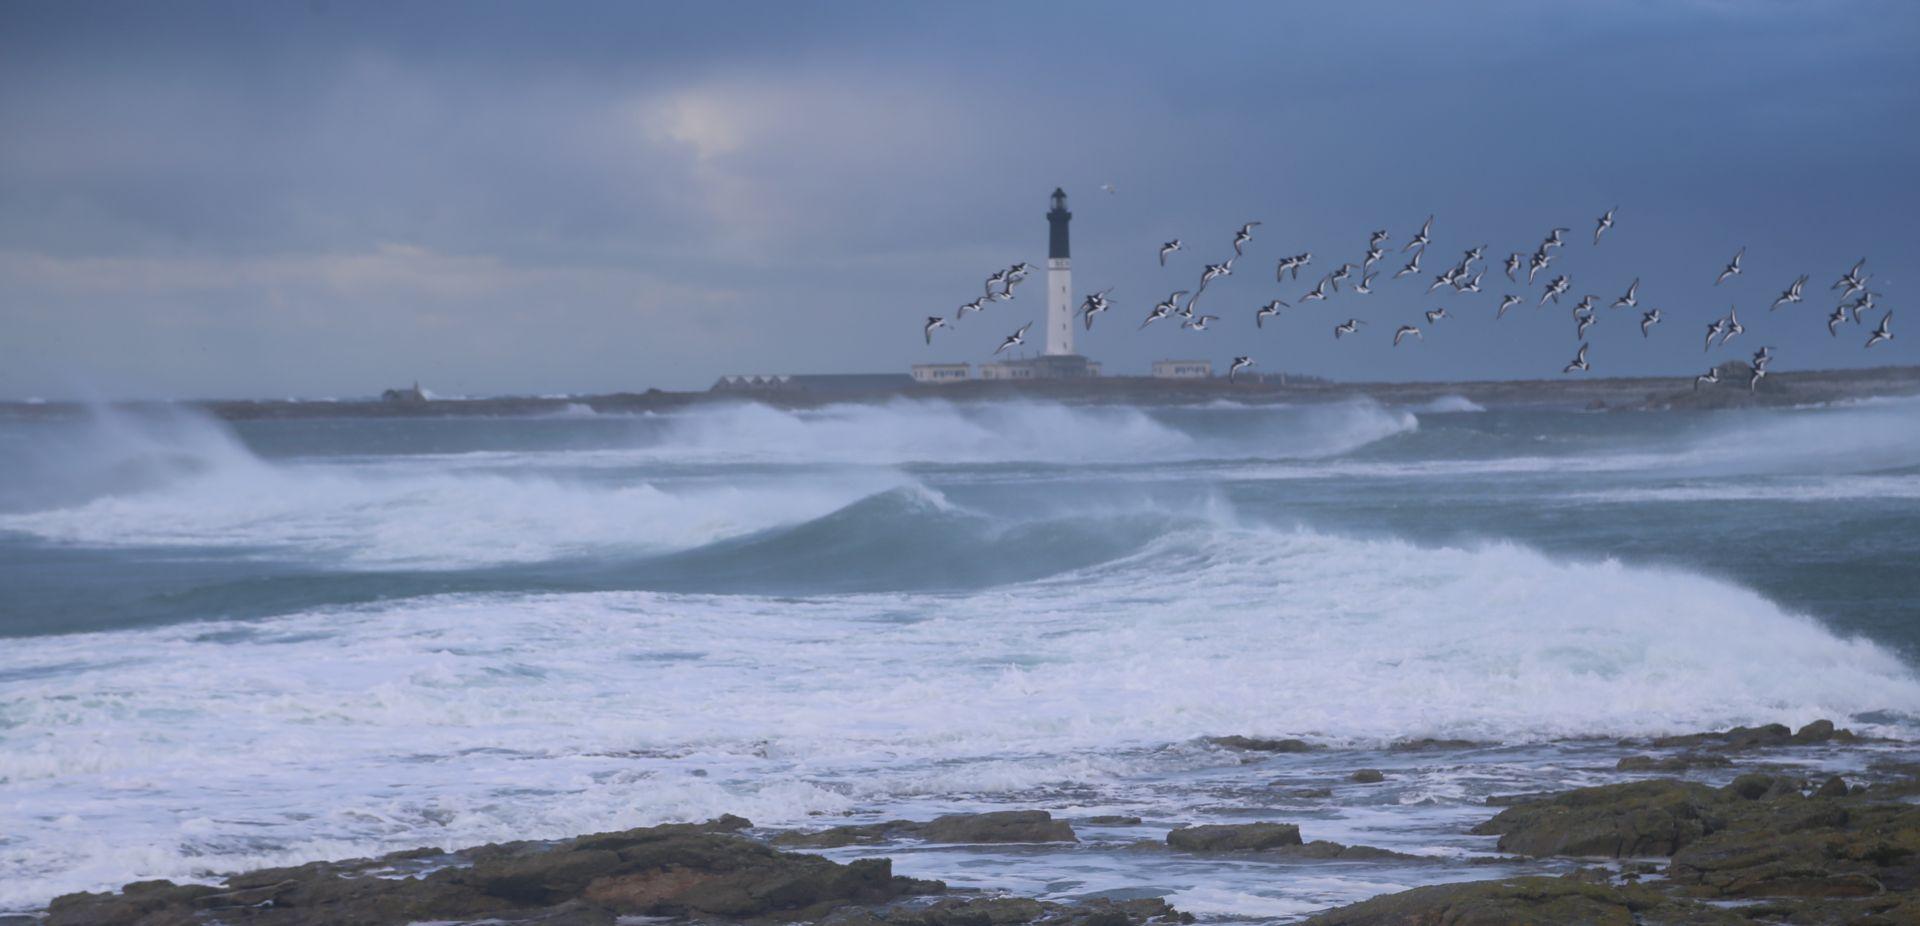 bord de mer, paysage breton, bretagne, vague, tempête